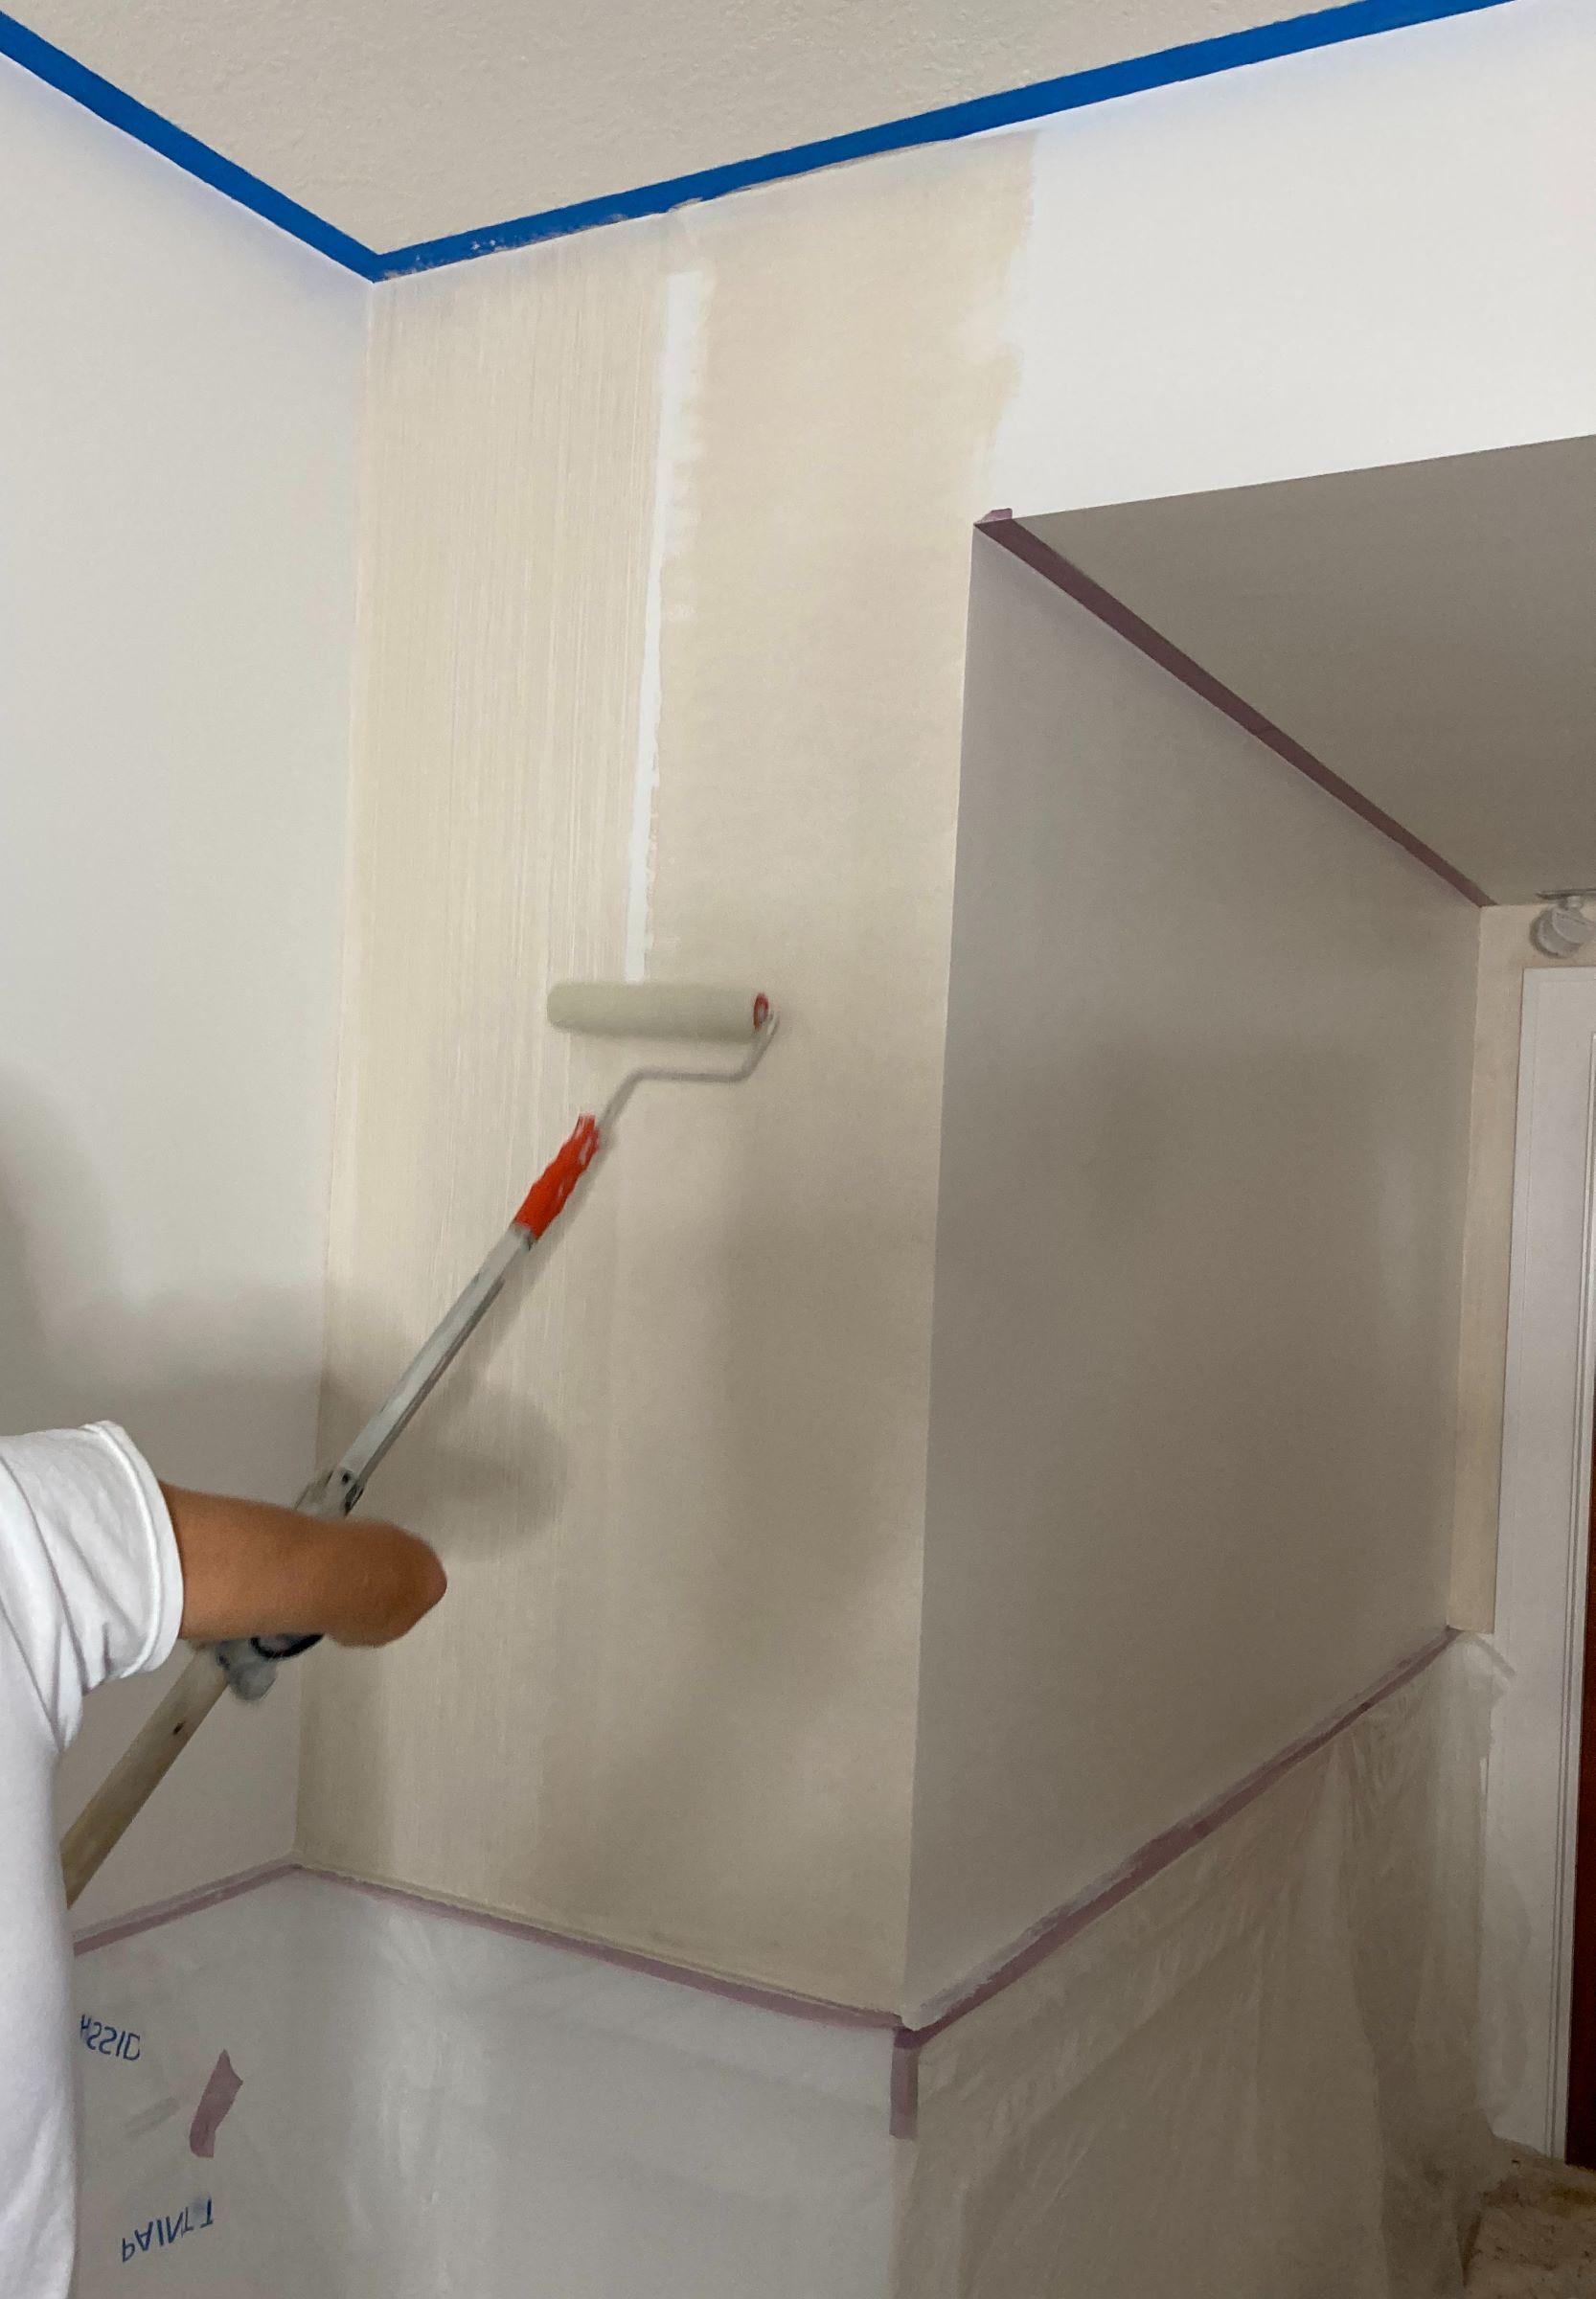 How to Paint a Striae Wall Faux Finish - ArtzyFartzyCreations.com